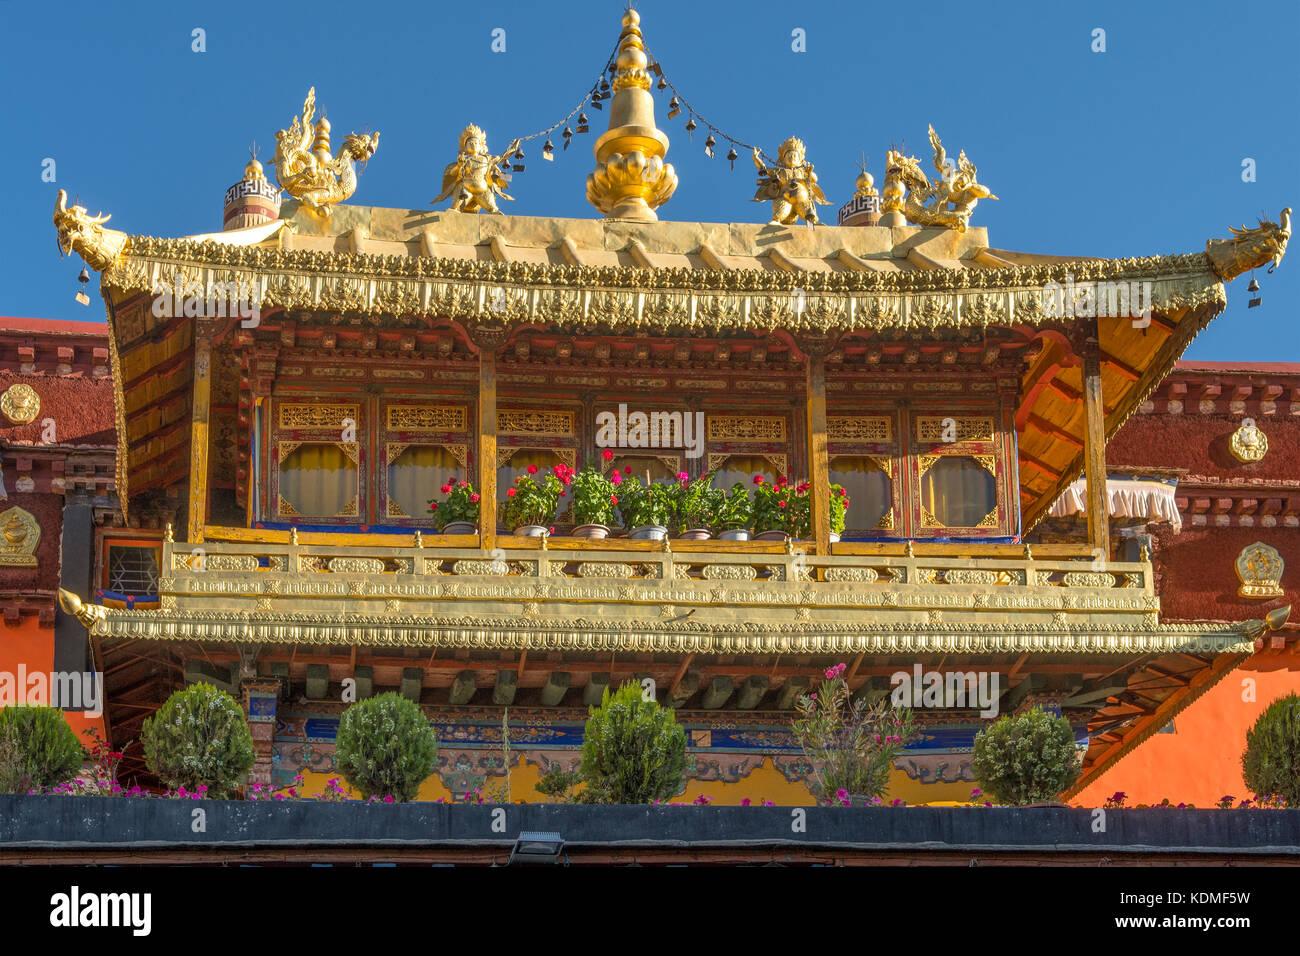 Jokhang Temple, Lhasa, Tibet, China - Stock Image